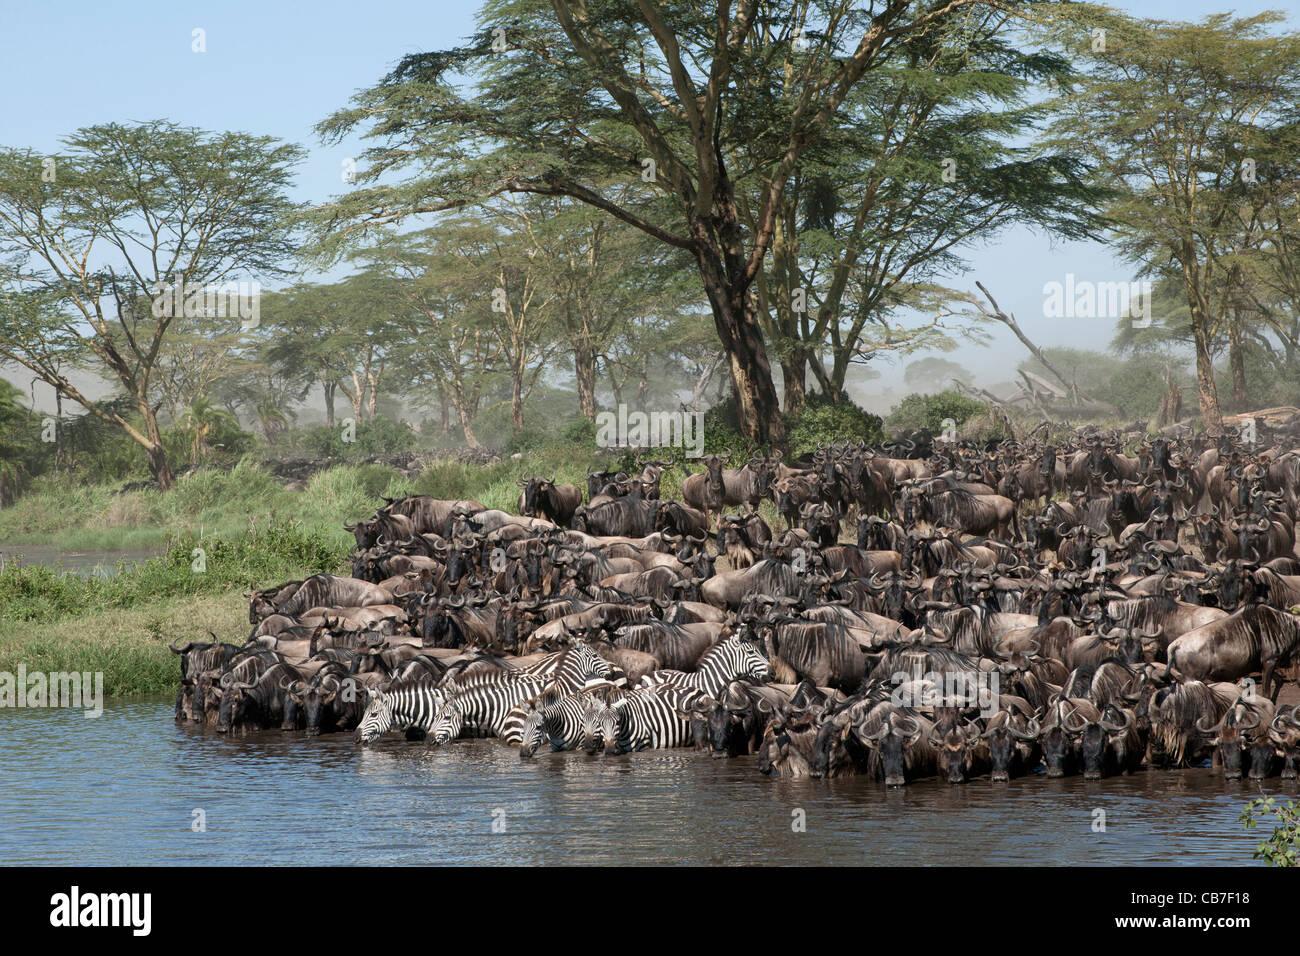 Herds of wildebeest and zebra at the Serengeti National Park, Tanzania, Africa - Stock Image